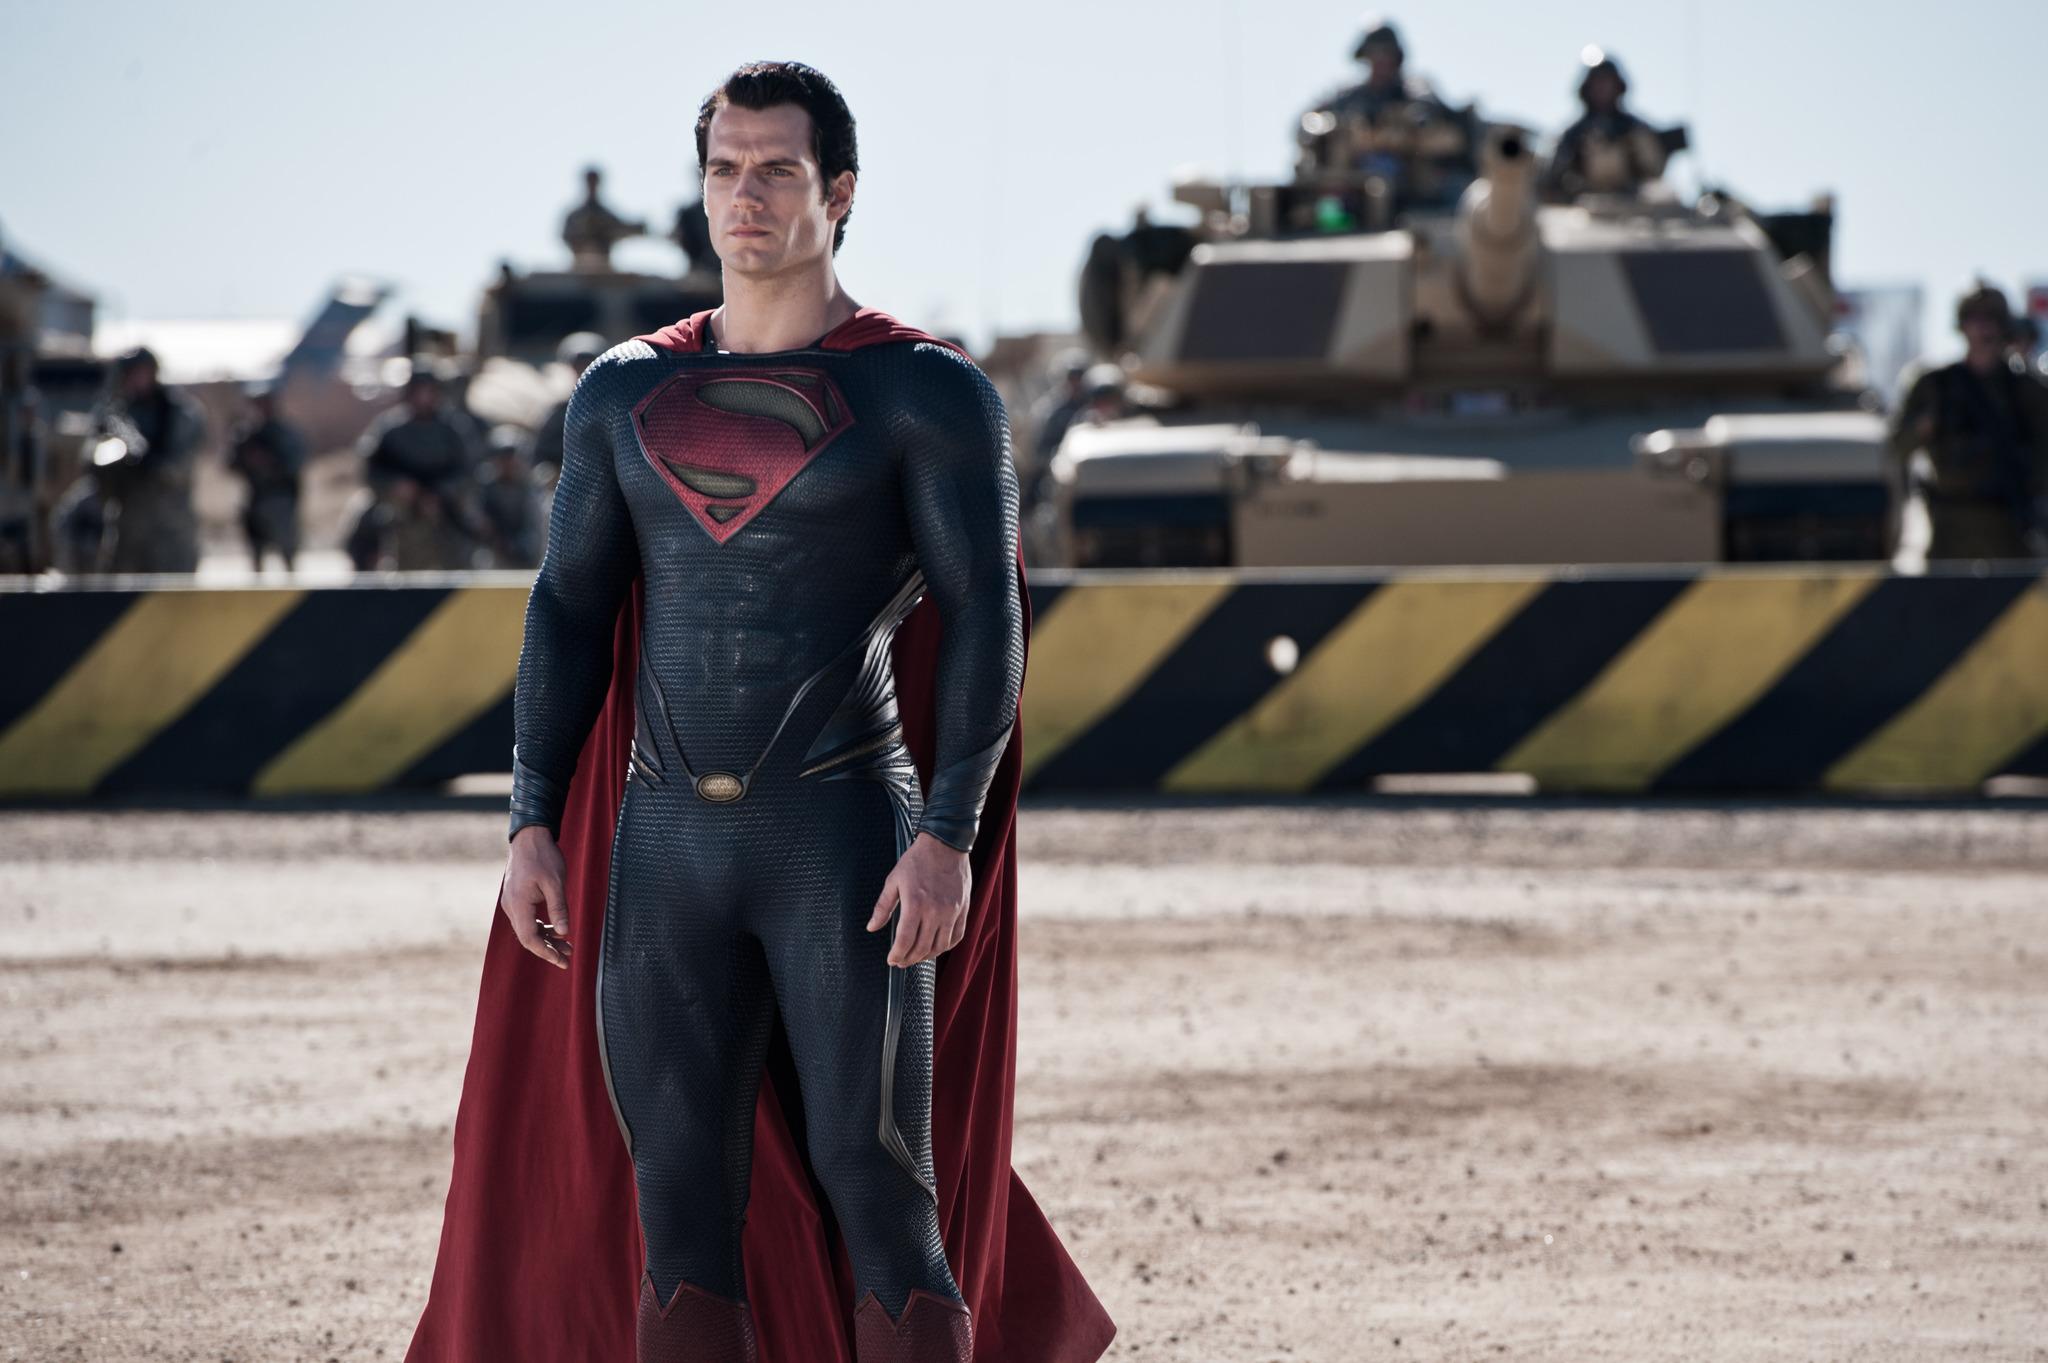 Azul y Rojo - Superhéroes - Superman - Aliya - Elohim - Israel.jpg